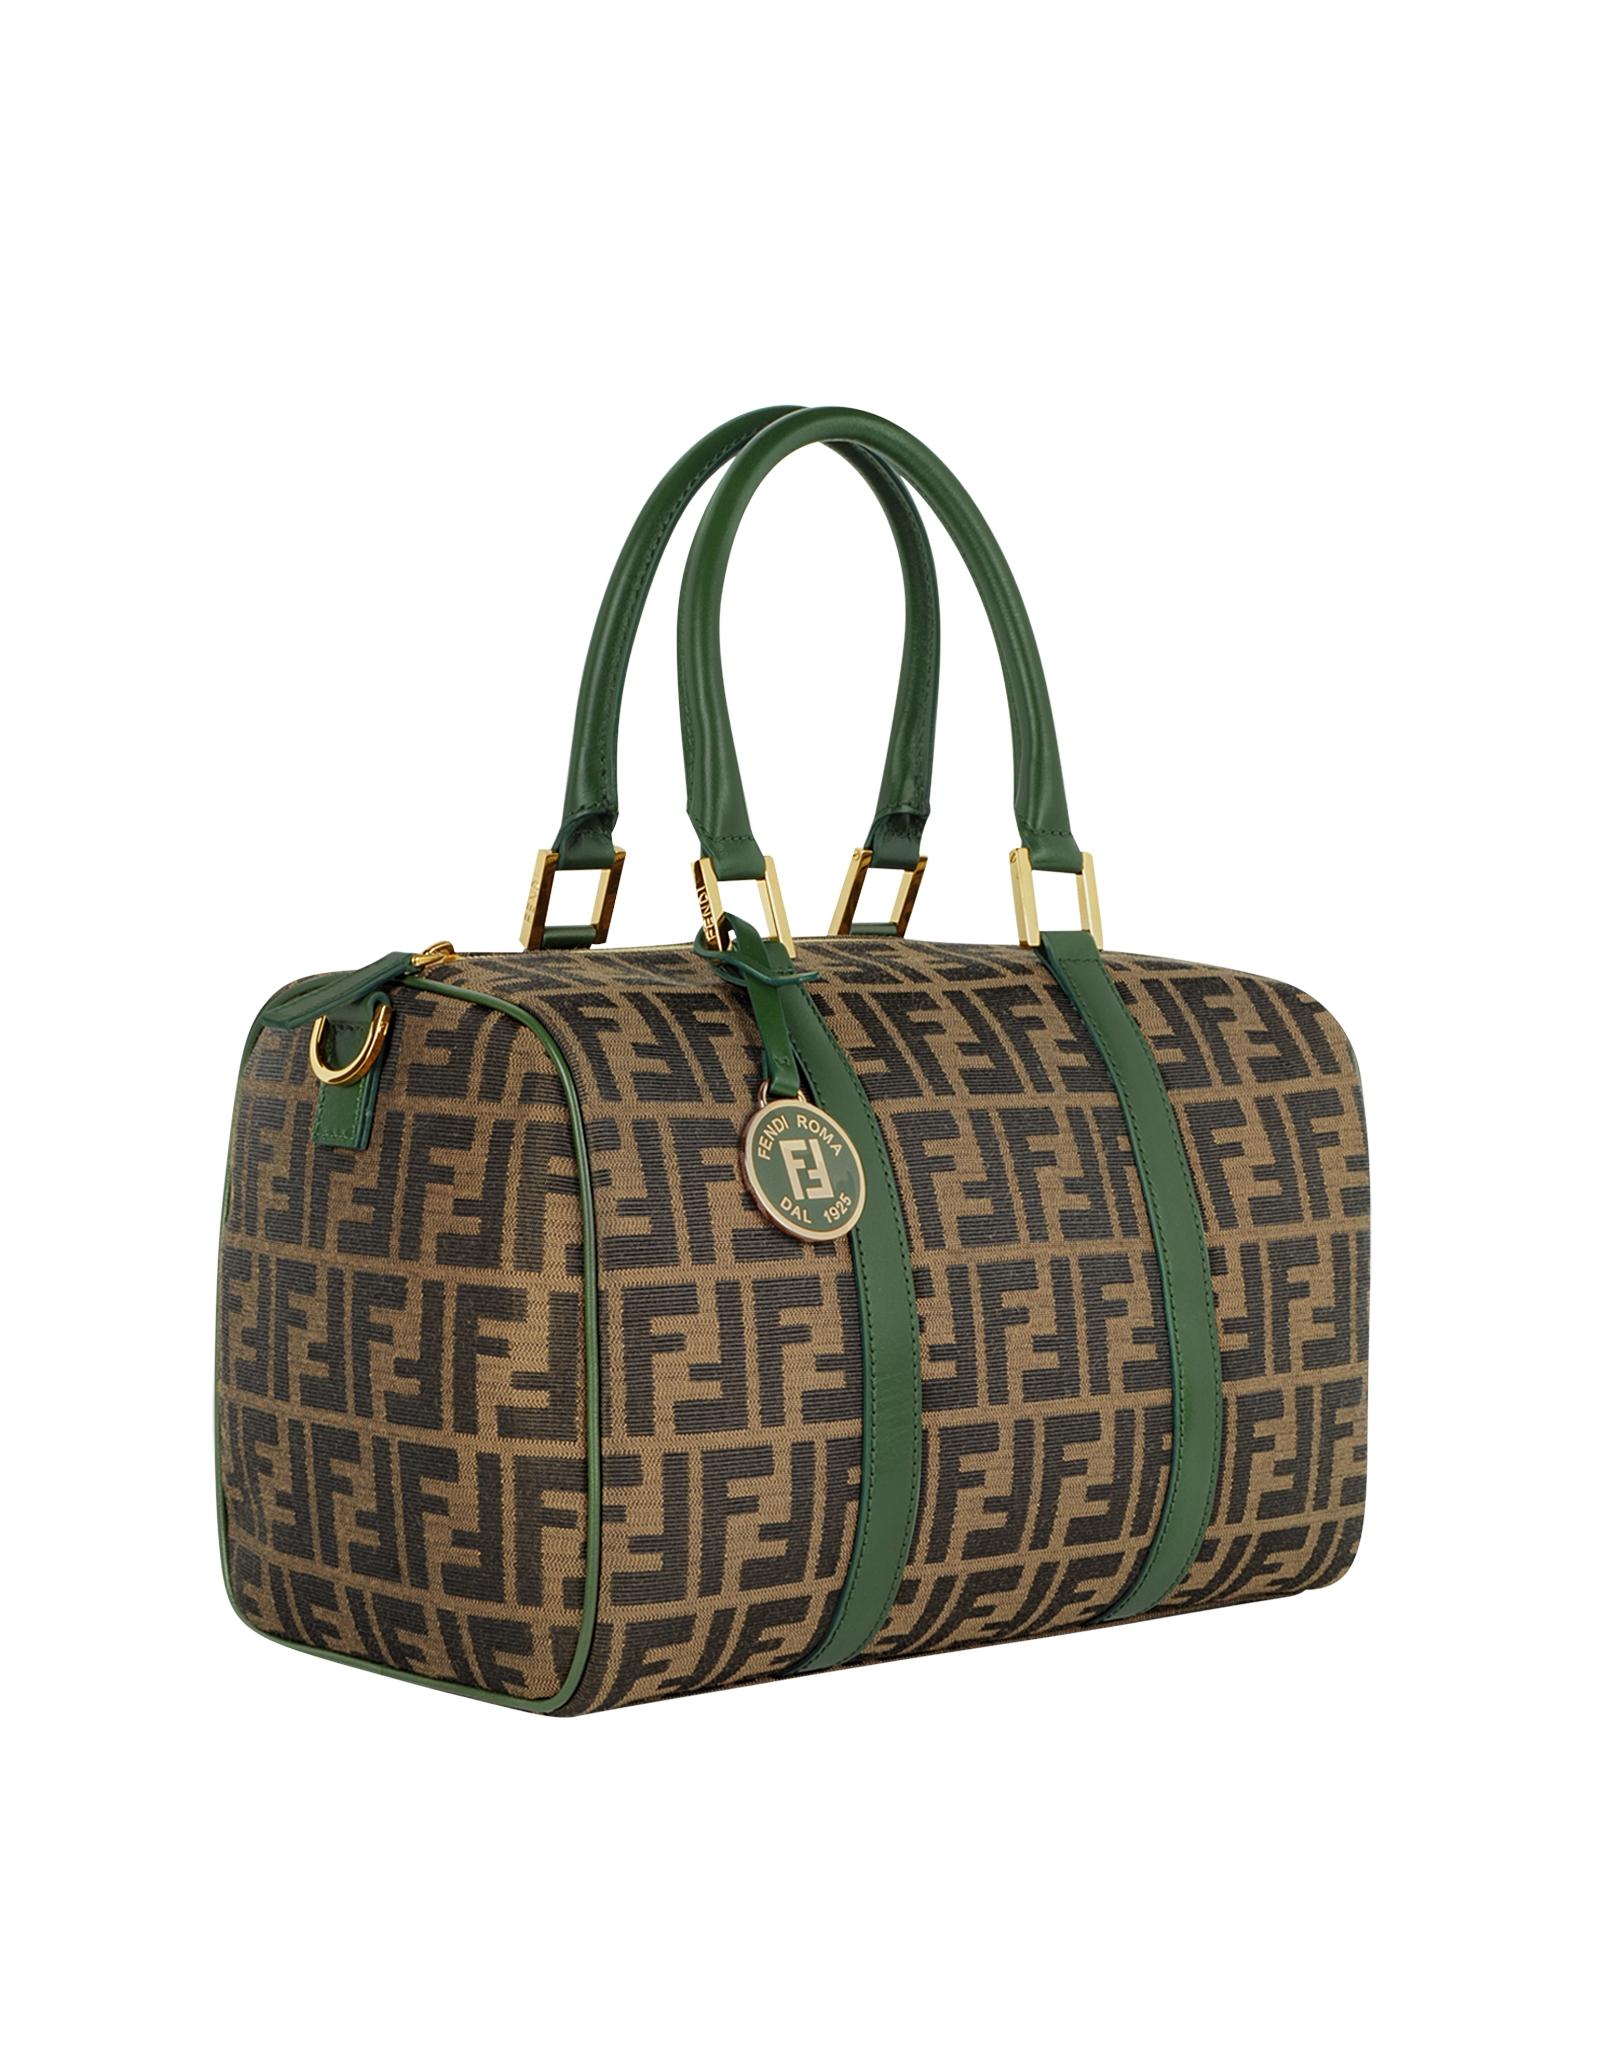 Gallery. Women s Fendi Zucca Women s Louis Vuitton Galliera Women s Tom  Ford Alix Bag ... 641e180fbb1d9